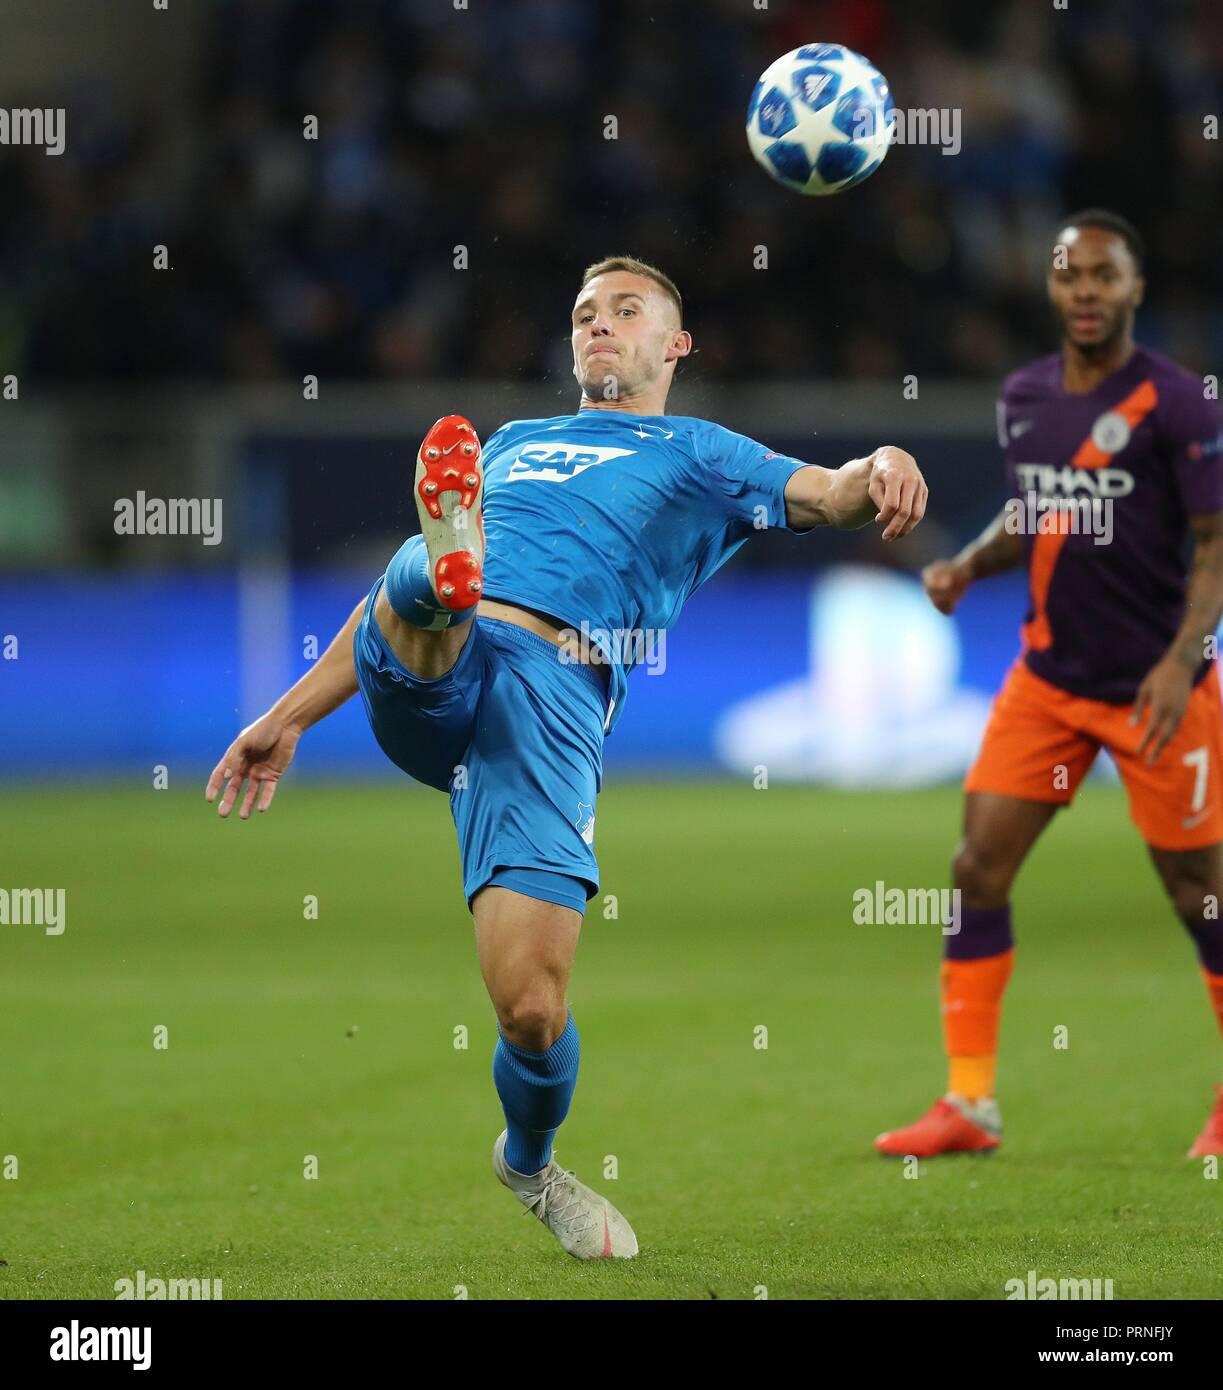 firo: 02.10.2018 Football, Football, Champions League: TSG Hoffenheim - Manchester City 1: 2 Pavel Kaderábek, Pavel Kaderabek, single action   usage worldwide - Stock Image